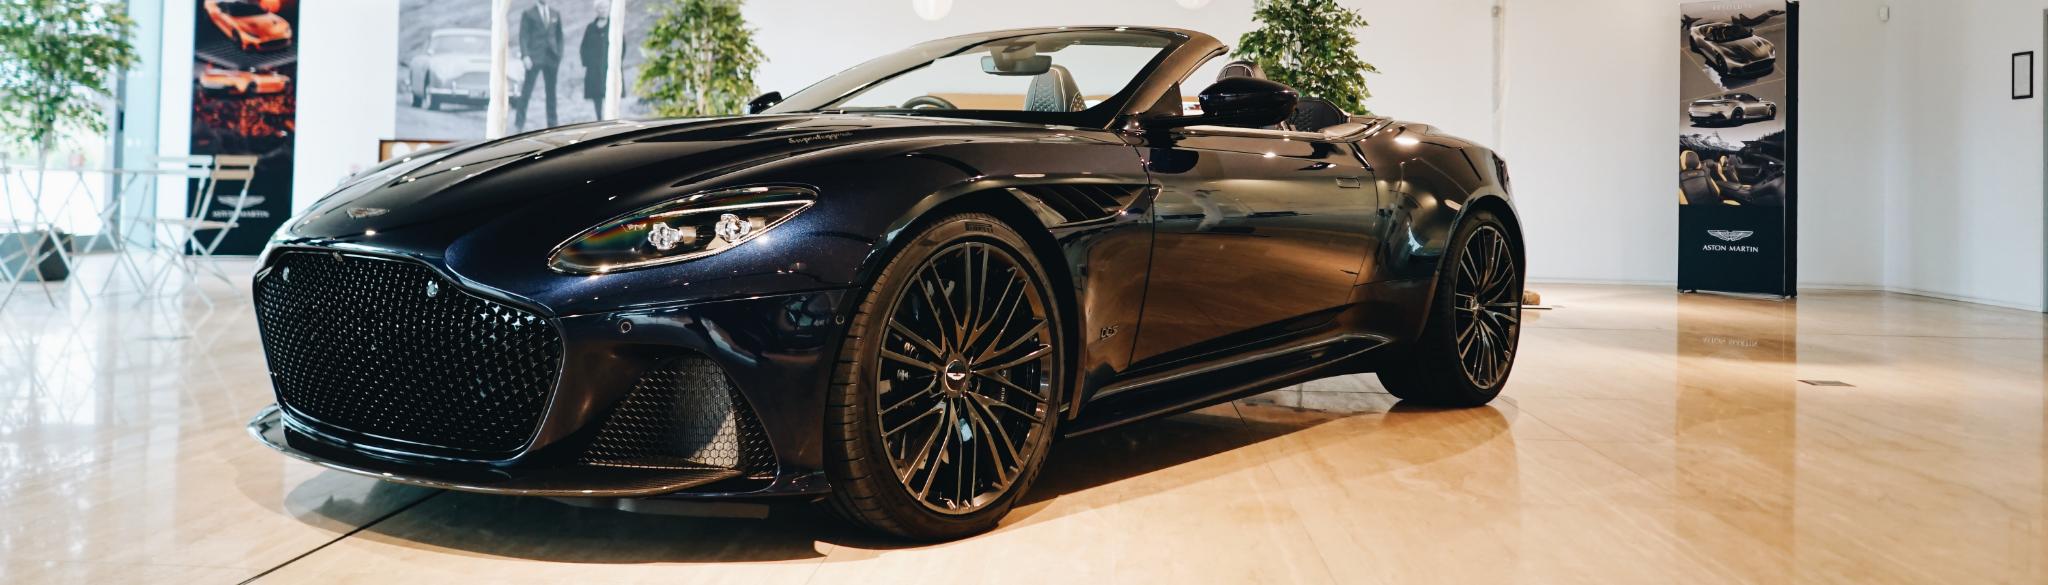 Aston Martin DBS Supperleggera Volante